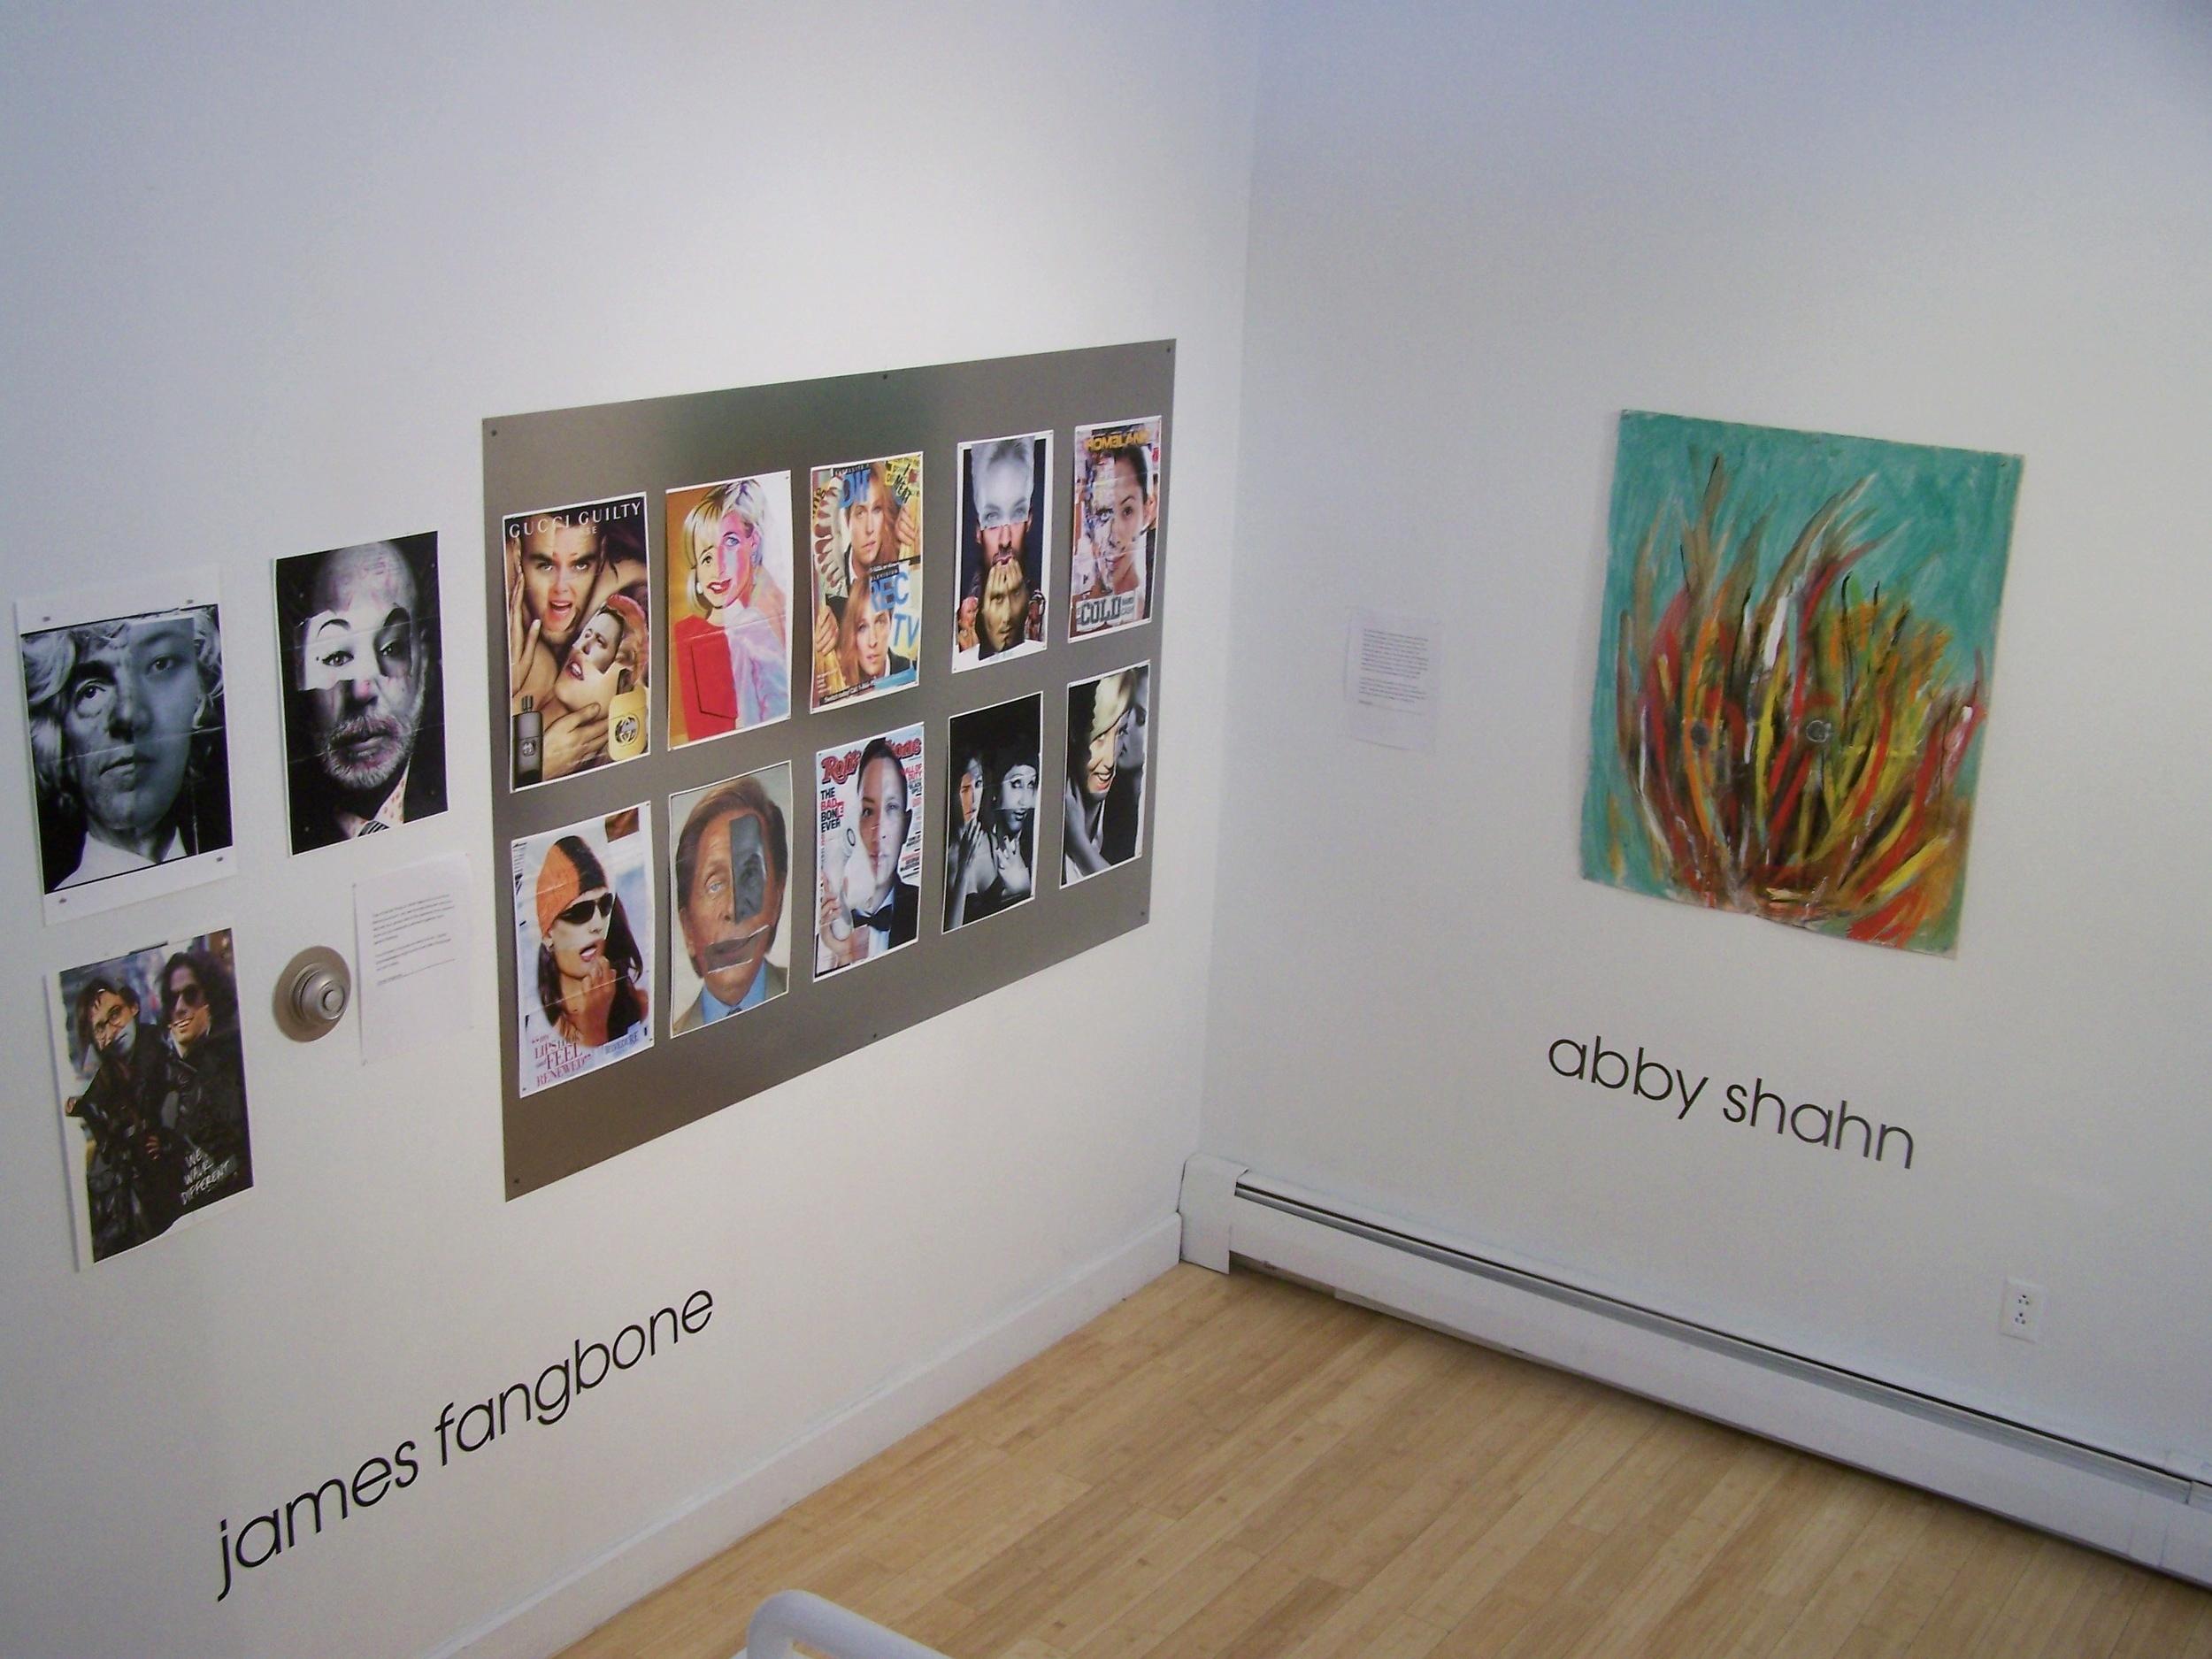 James Fangbone & Abby Shahn